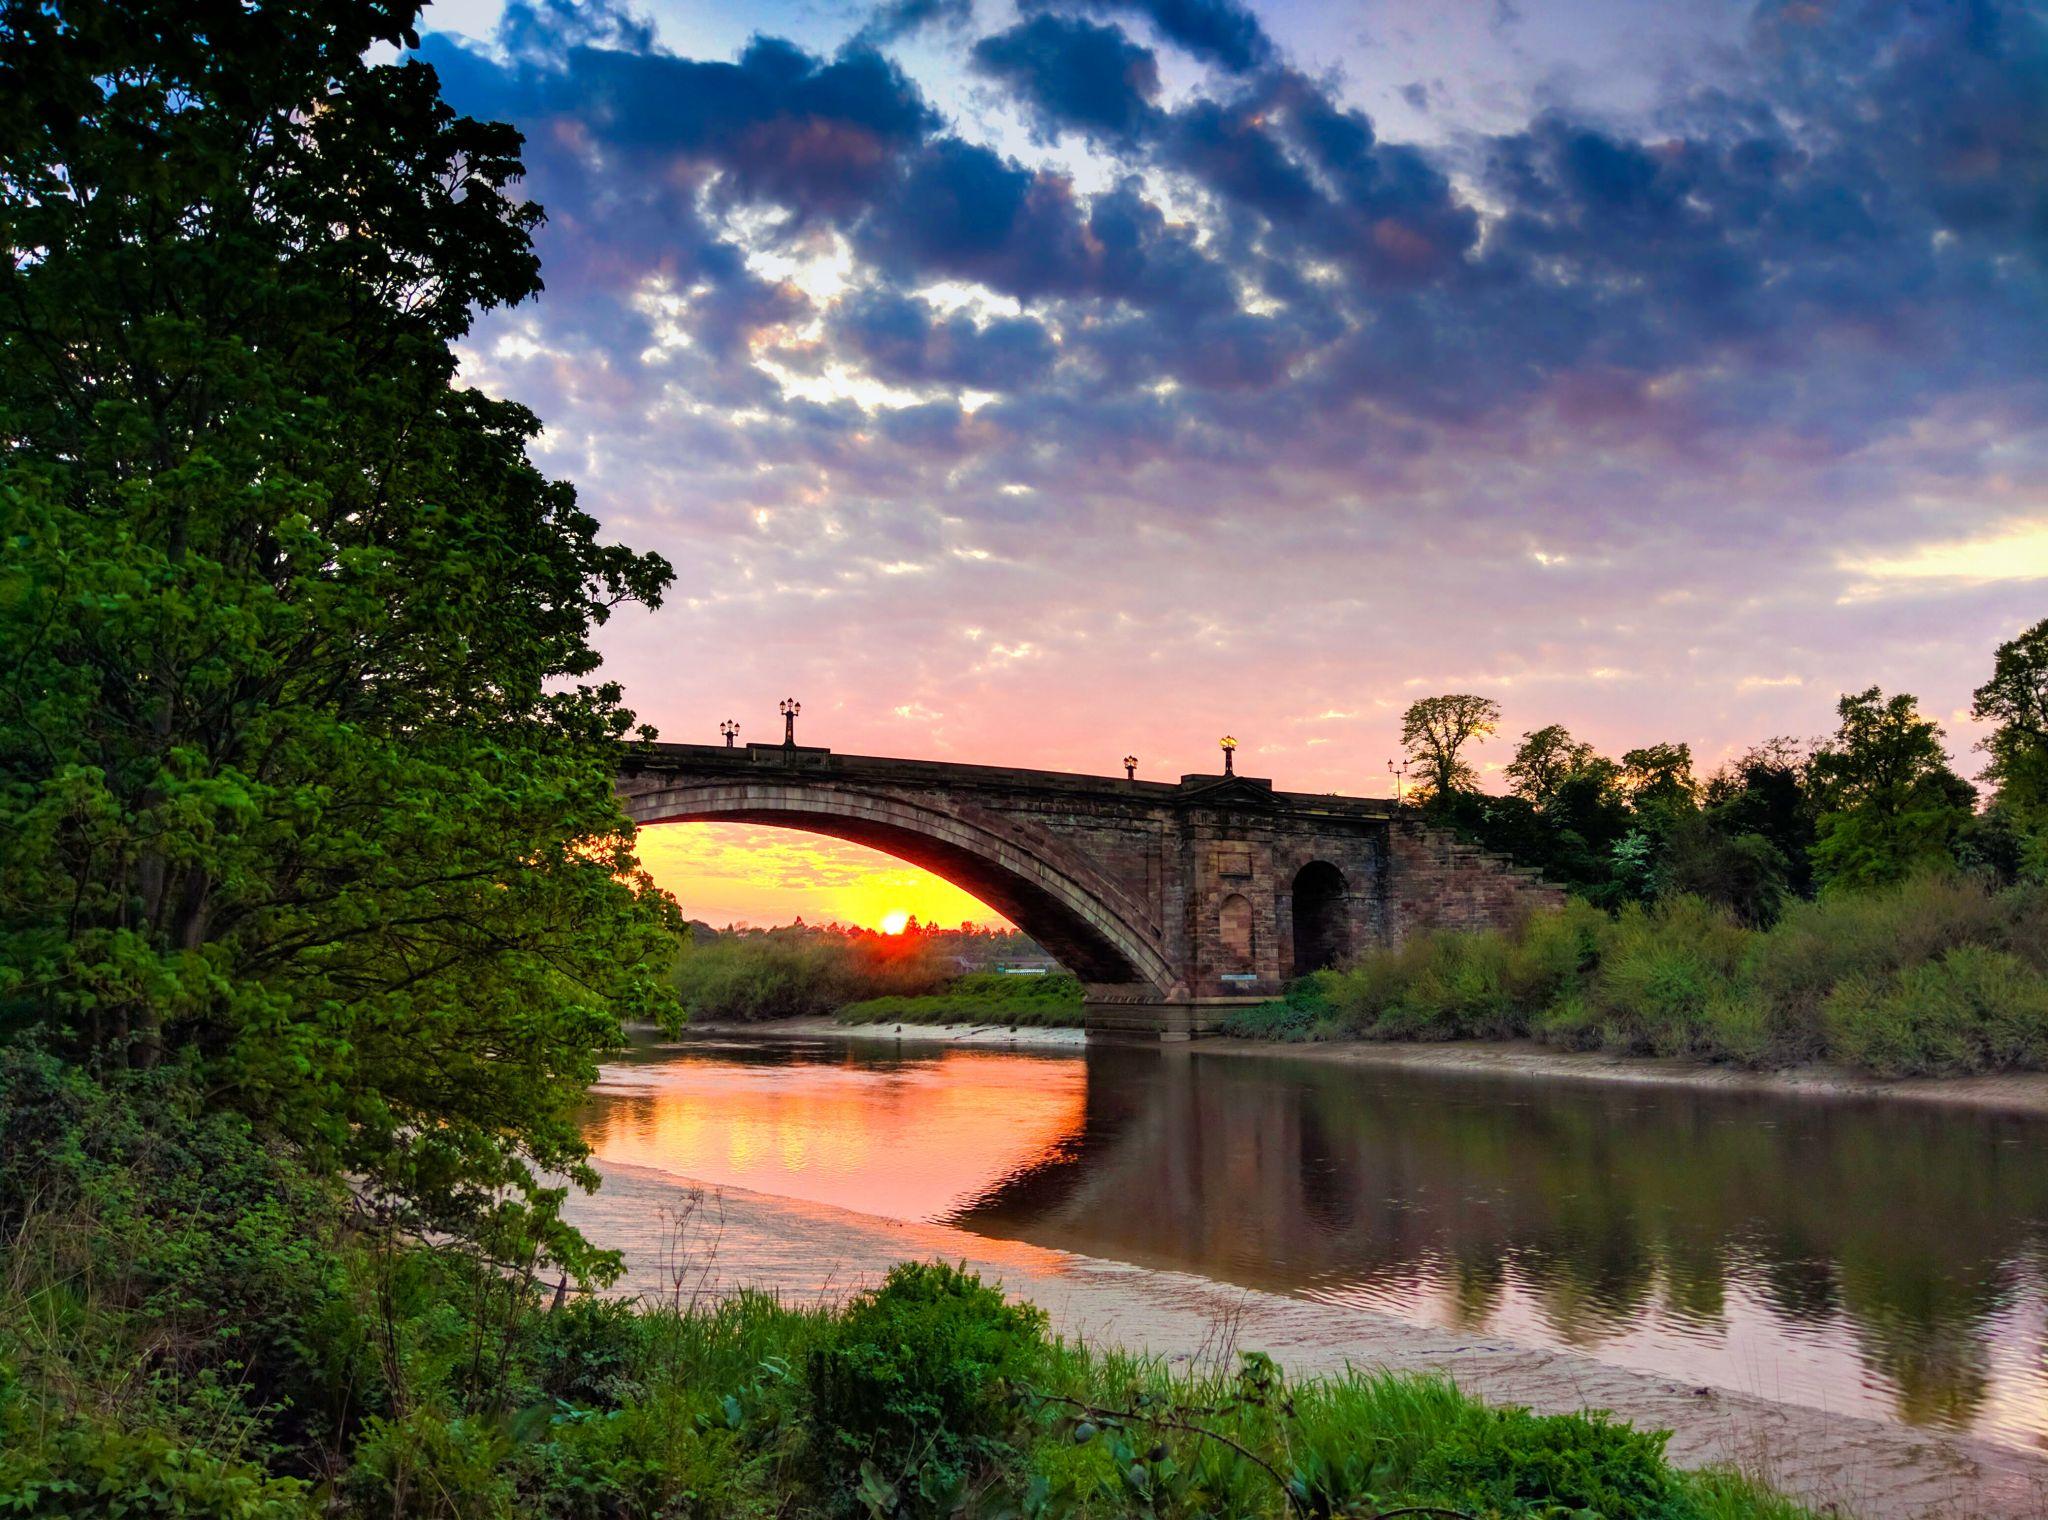 Grosvenor Bridge from River Dee, United Kingdom